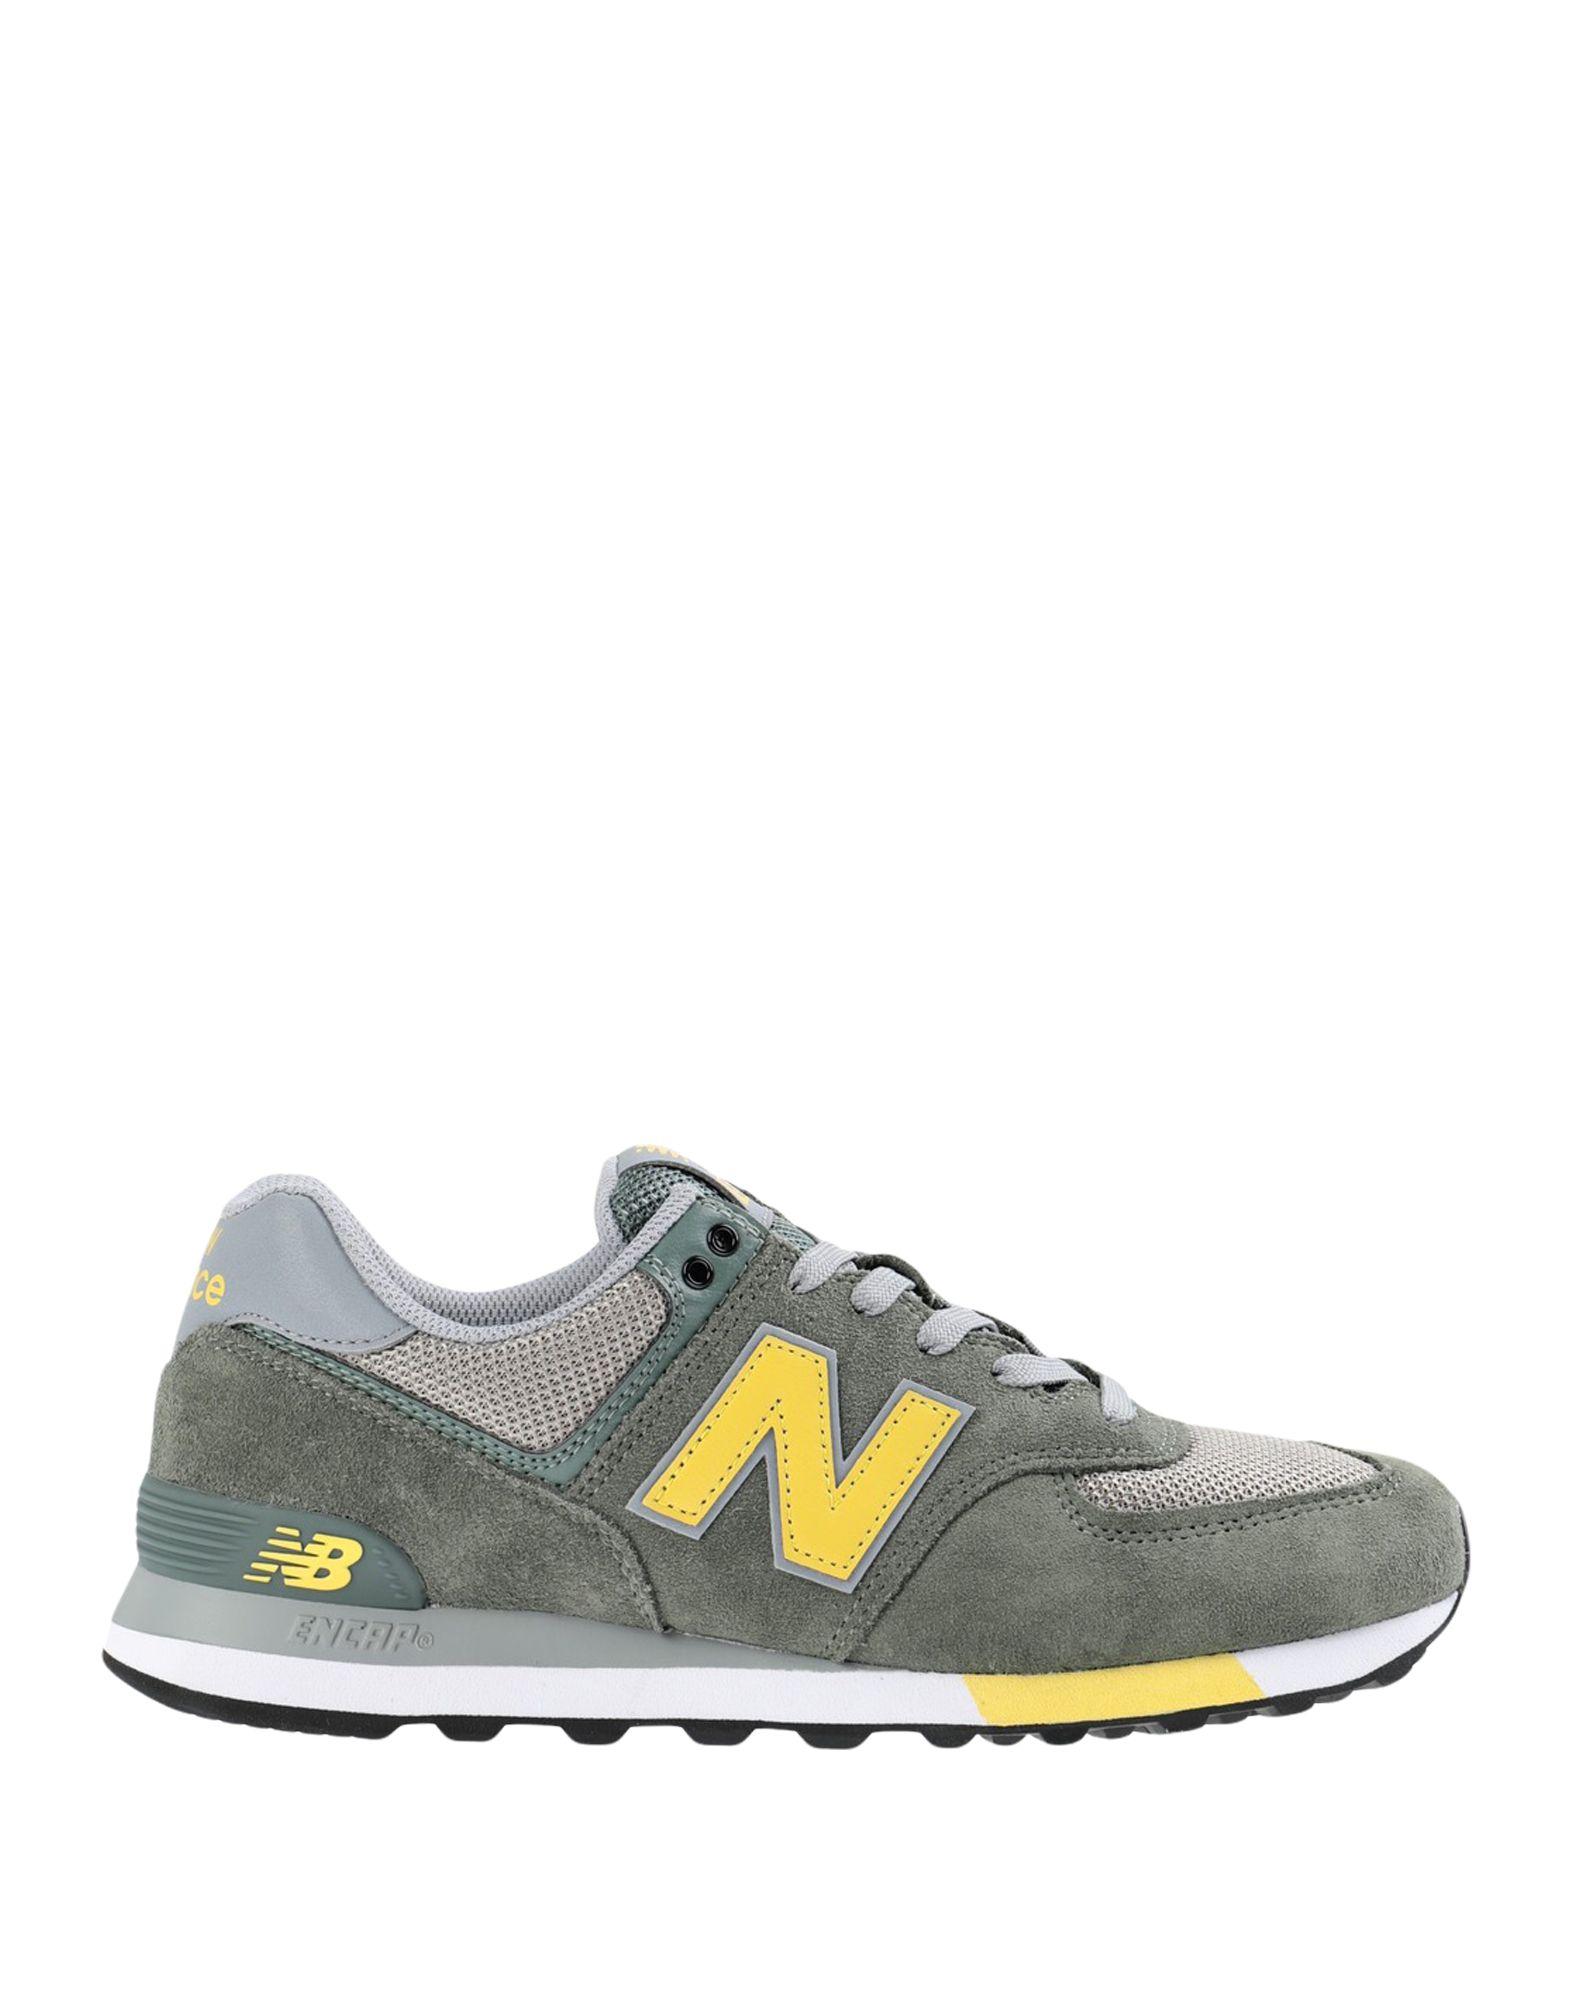 2019 heißer verkauf bekannte Marke detaillierter Blick New Balance 574 - Sneakers - Men New Balance Sneakers online ...